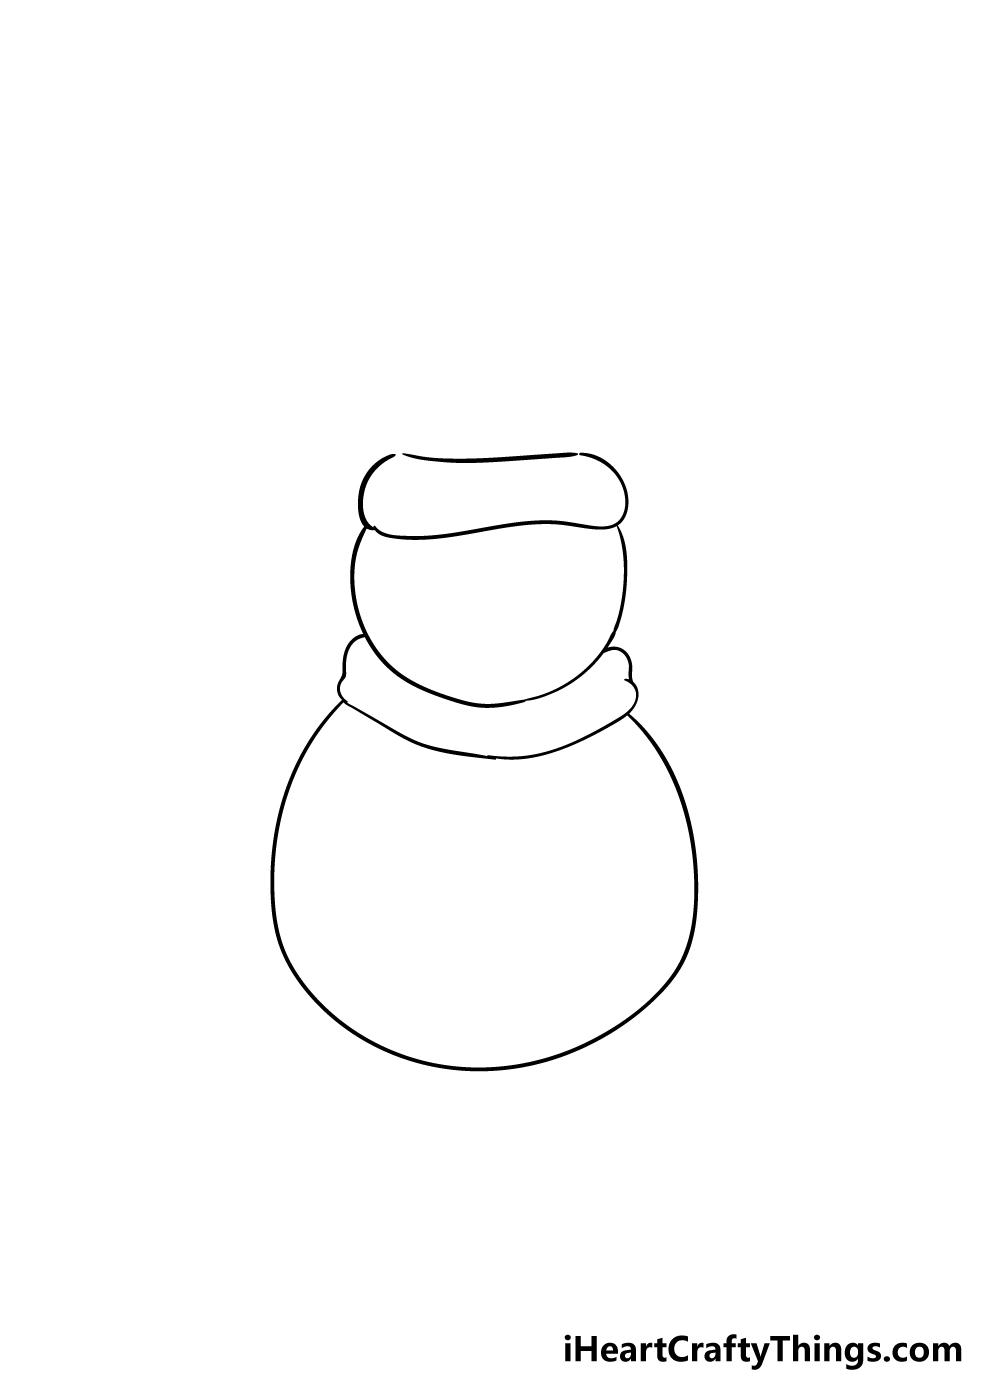 snowman drawing step 2